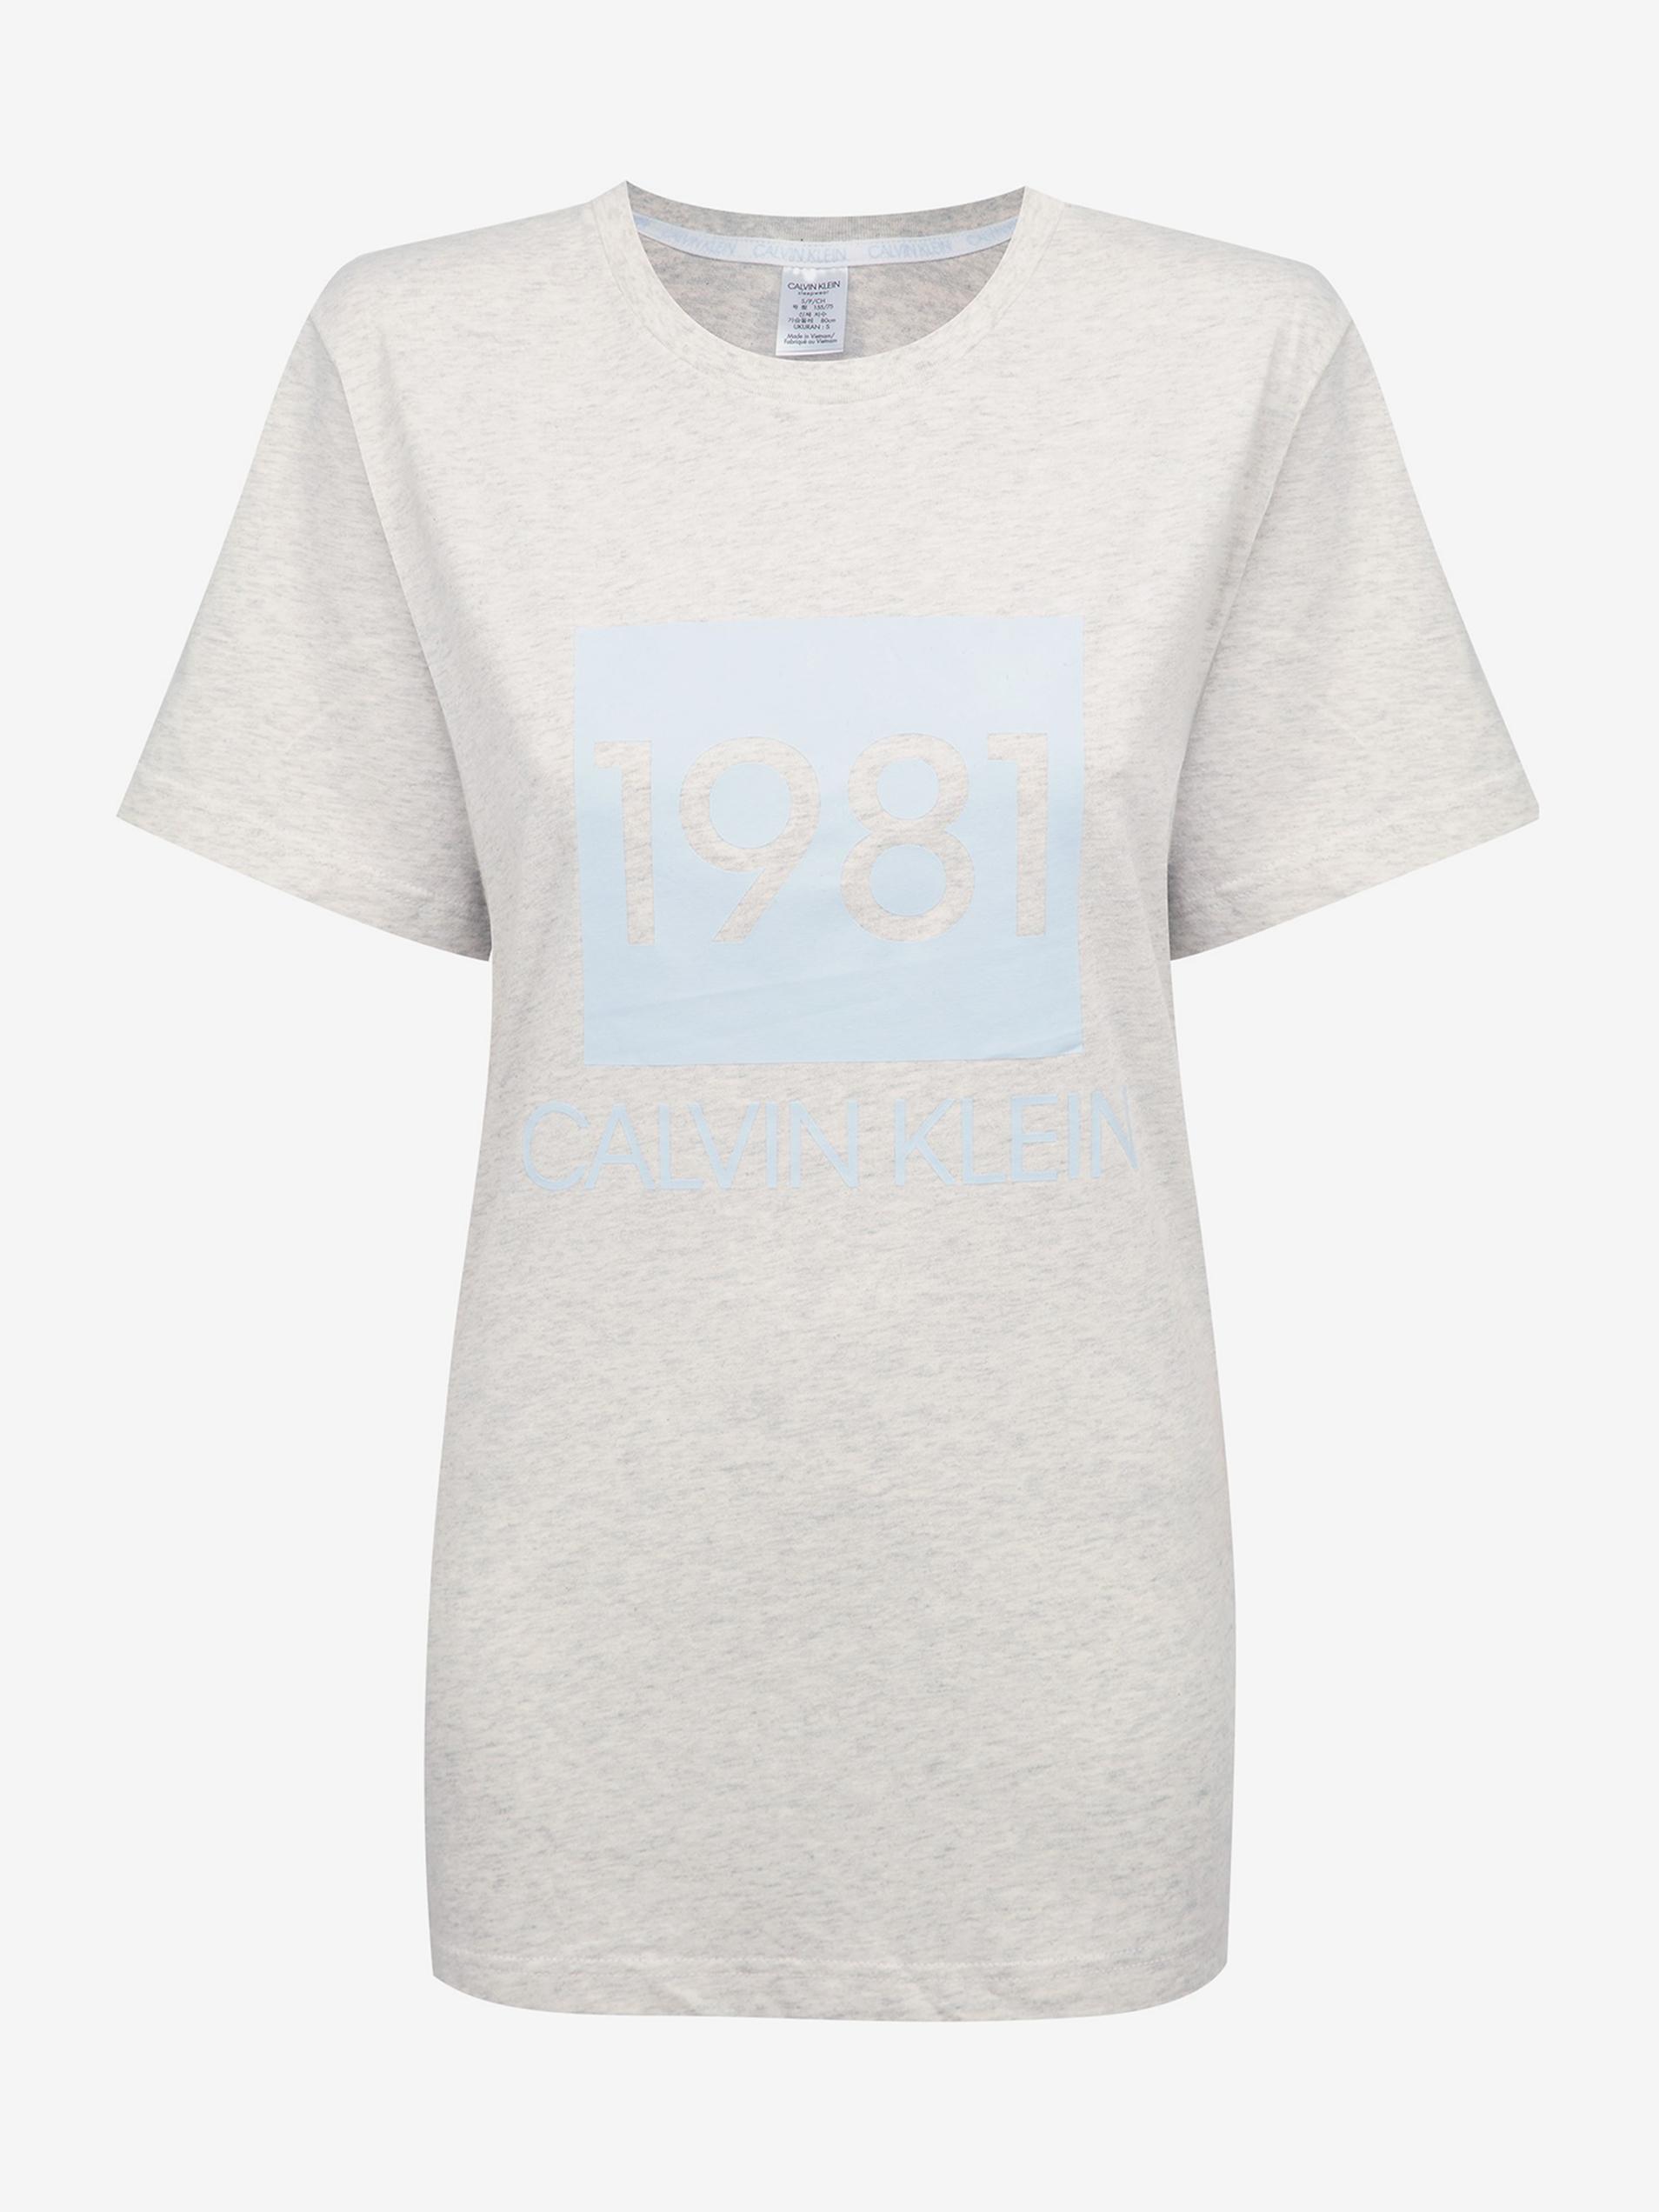 Calvin Klein sivé dámske tričko S/S Crew Neck s logom